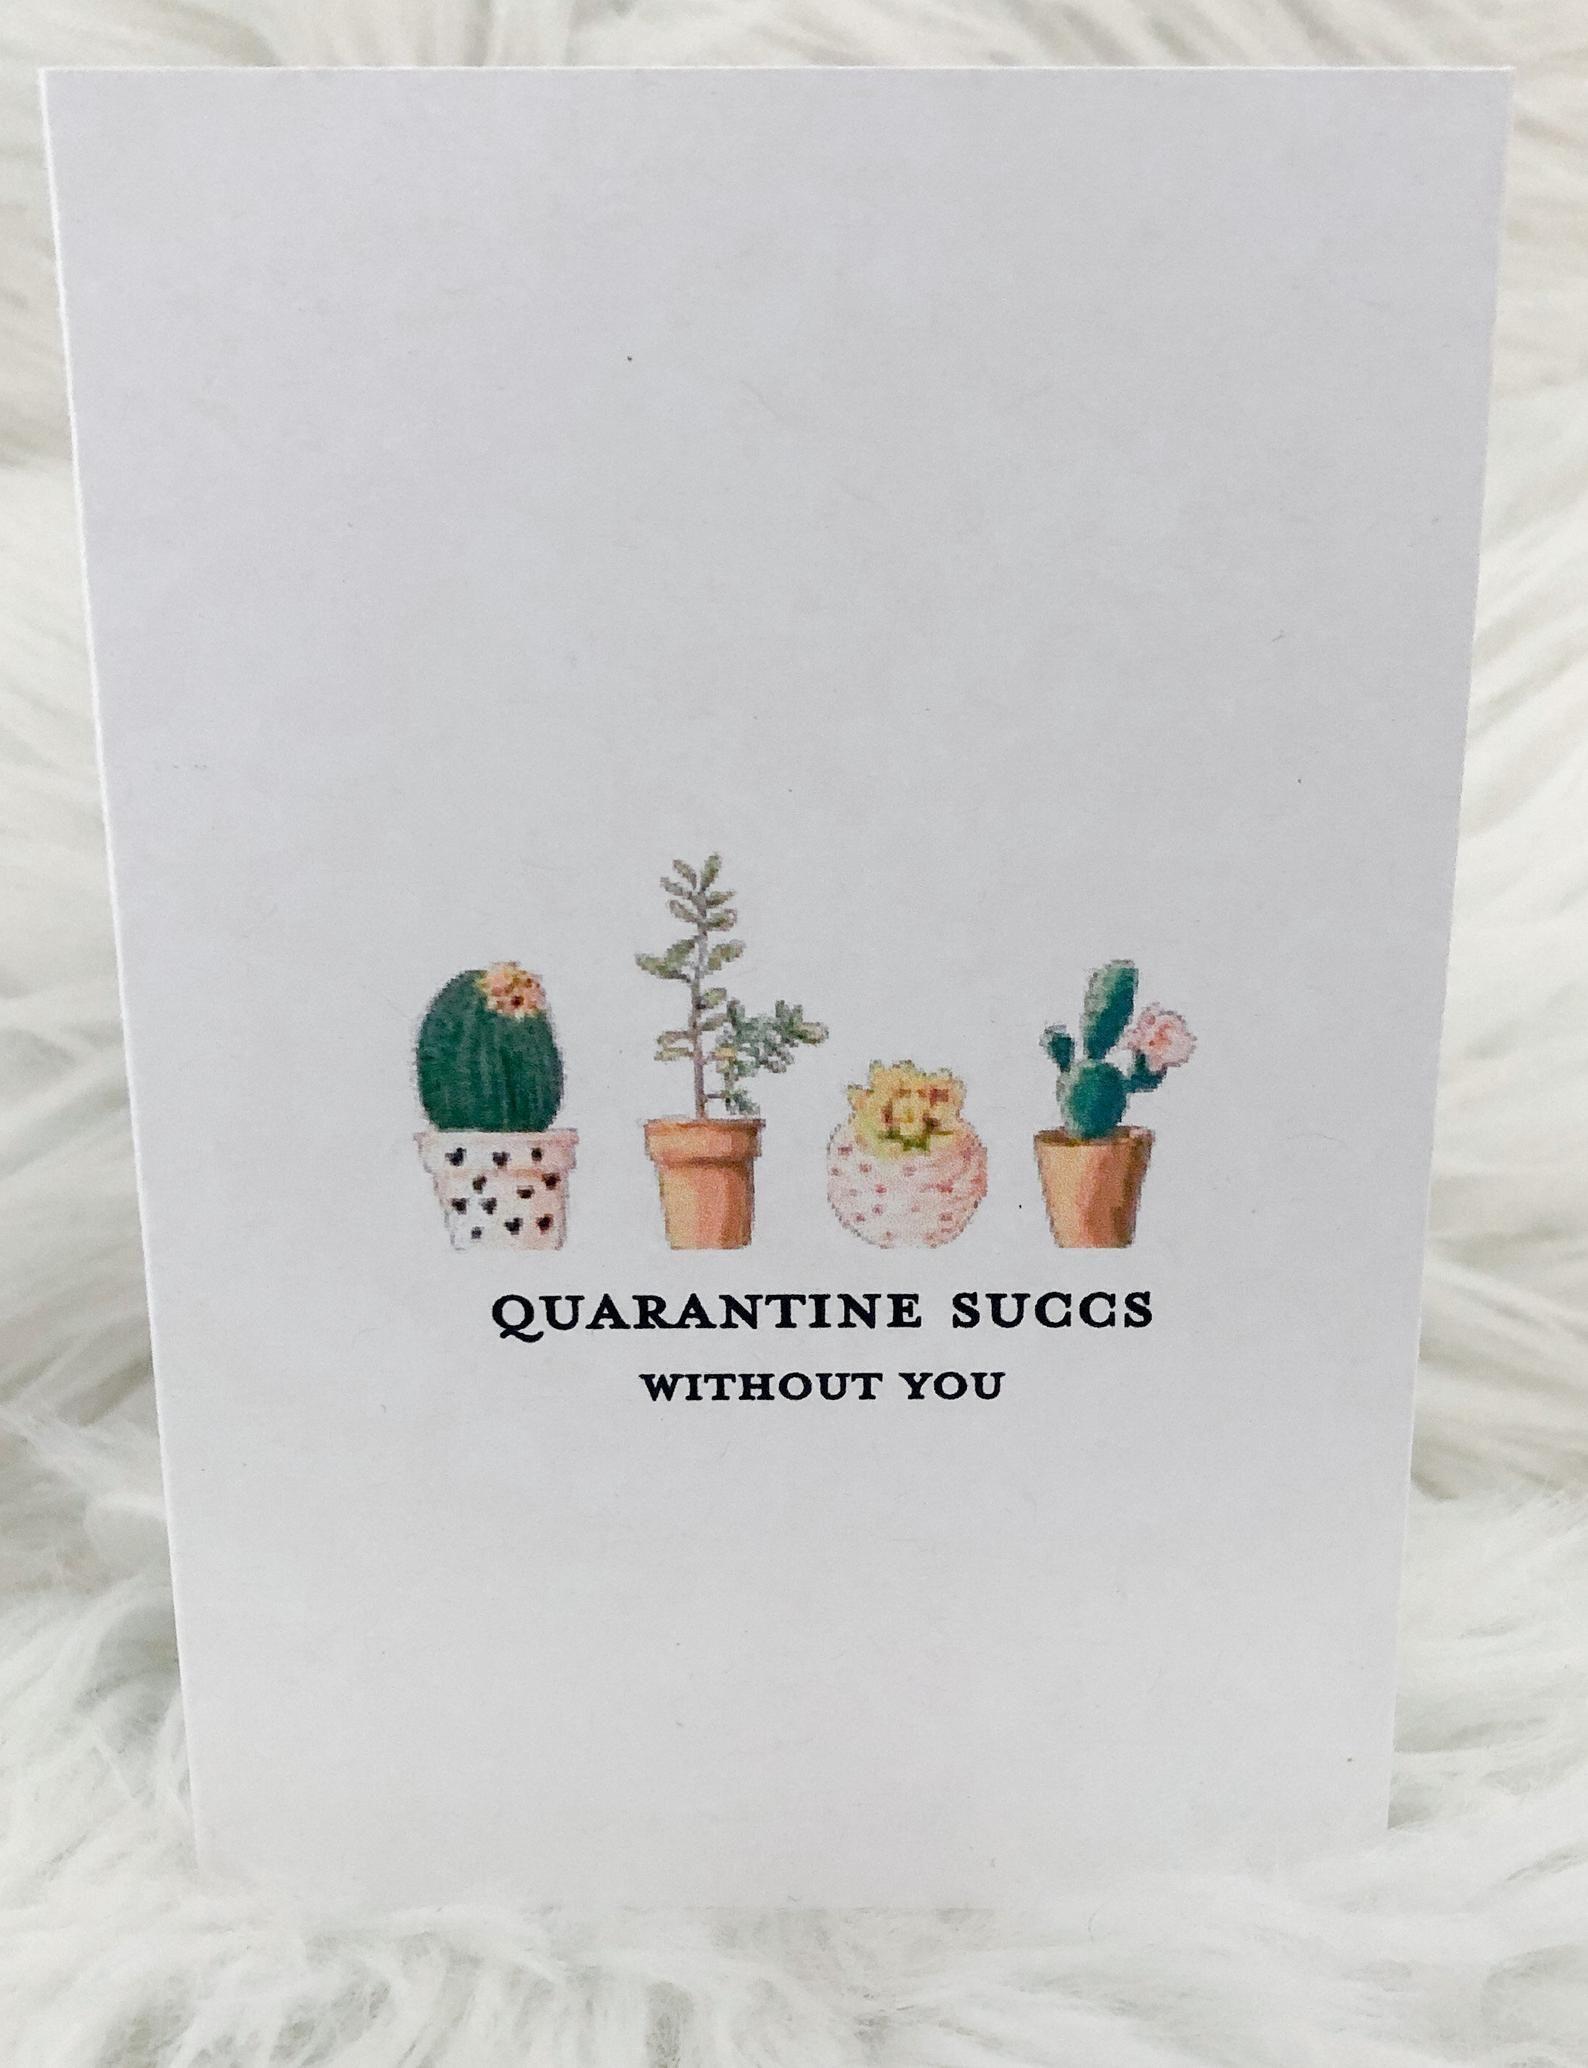 Pin on quarantine / isolation / inspiration